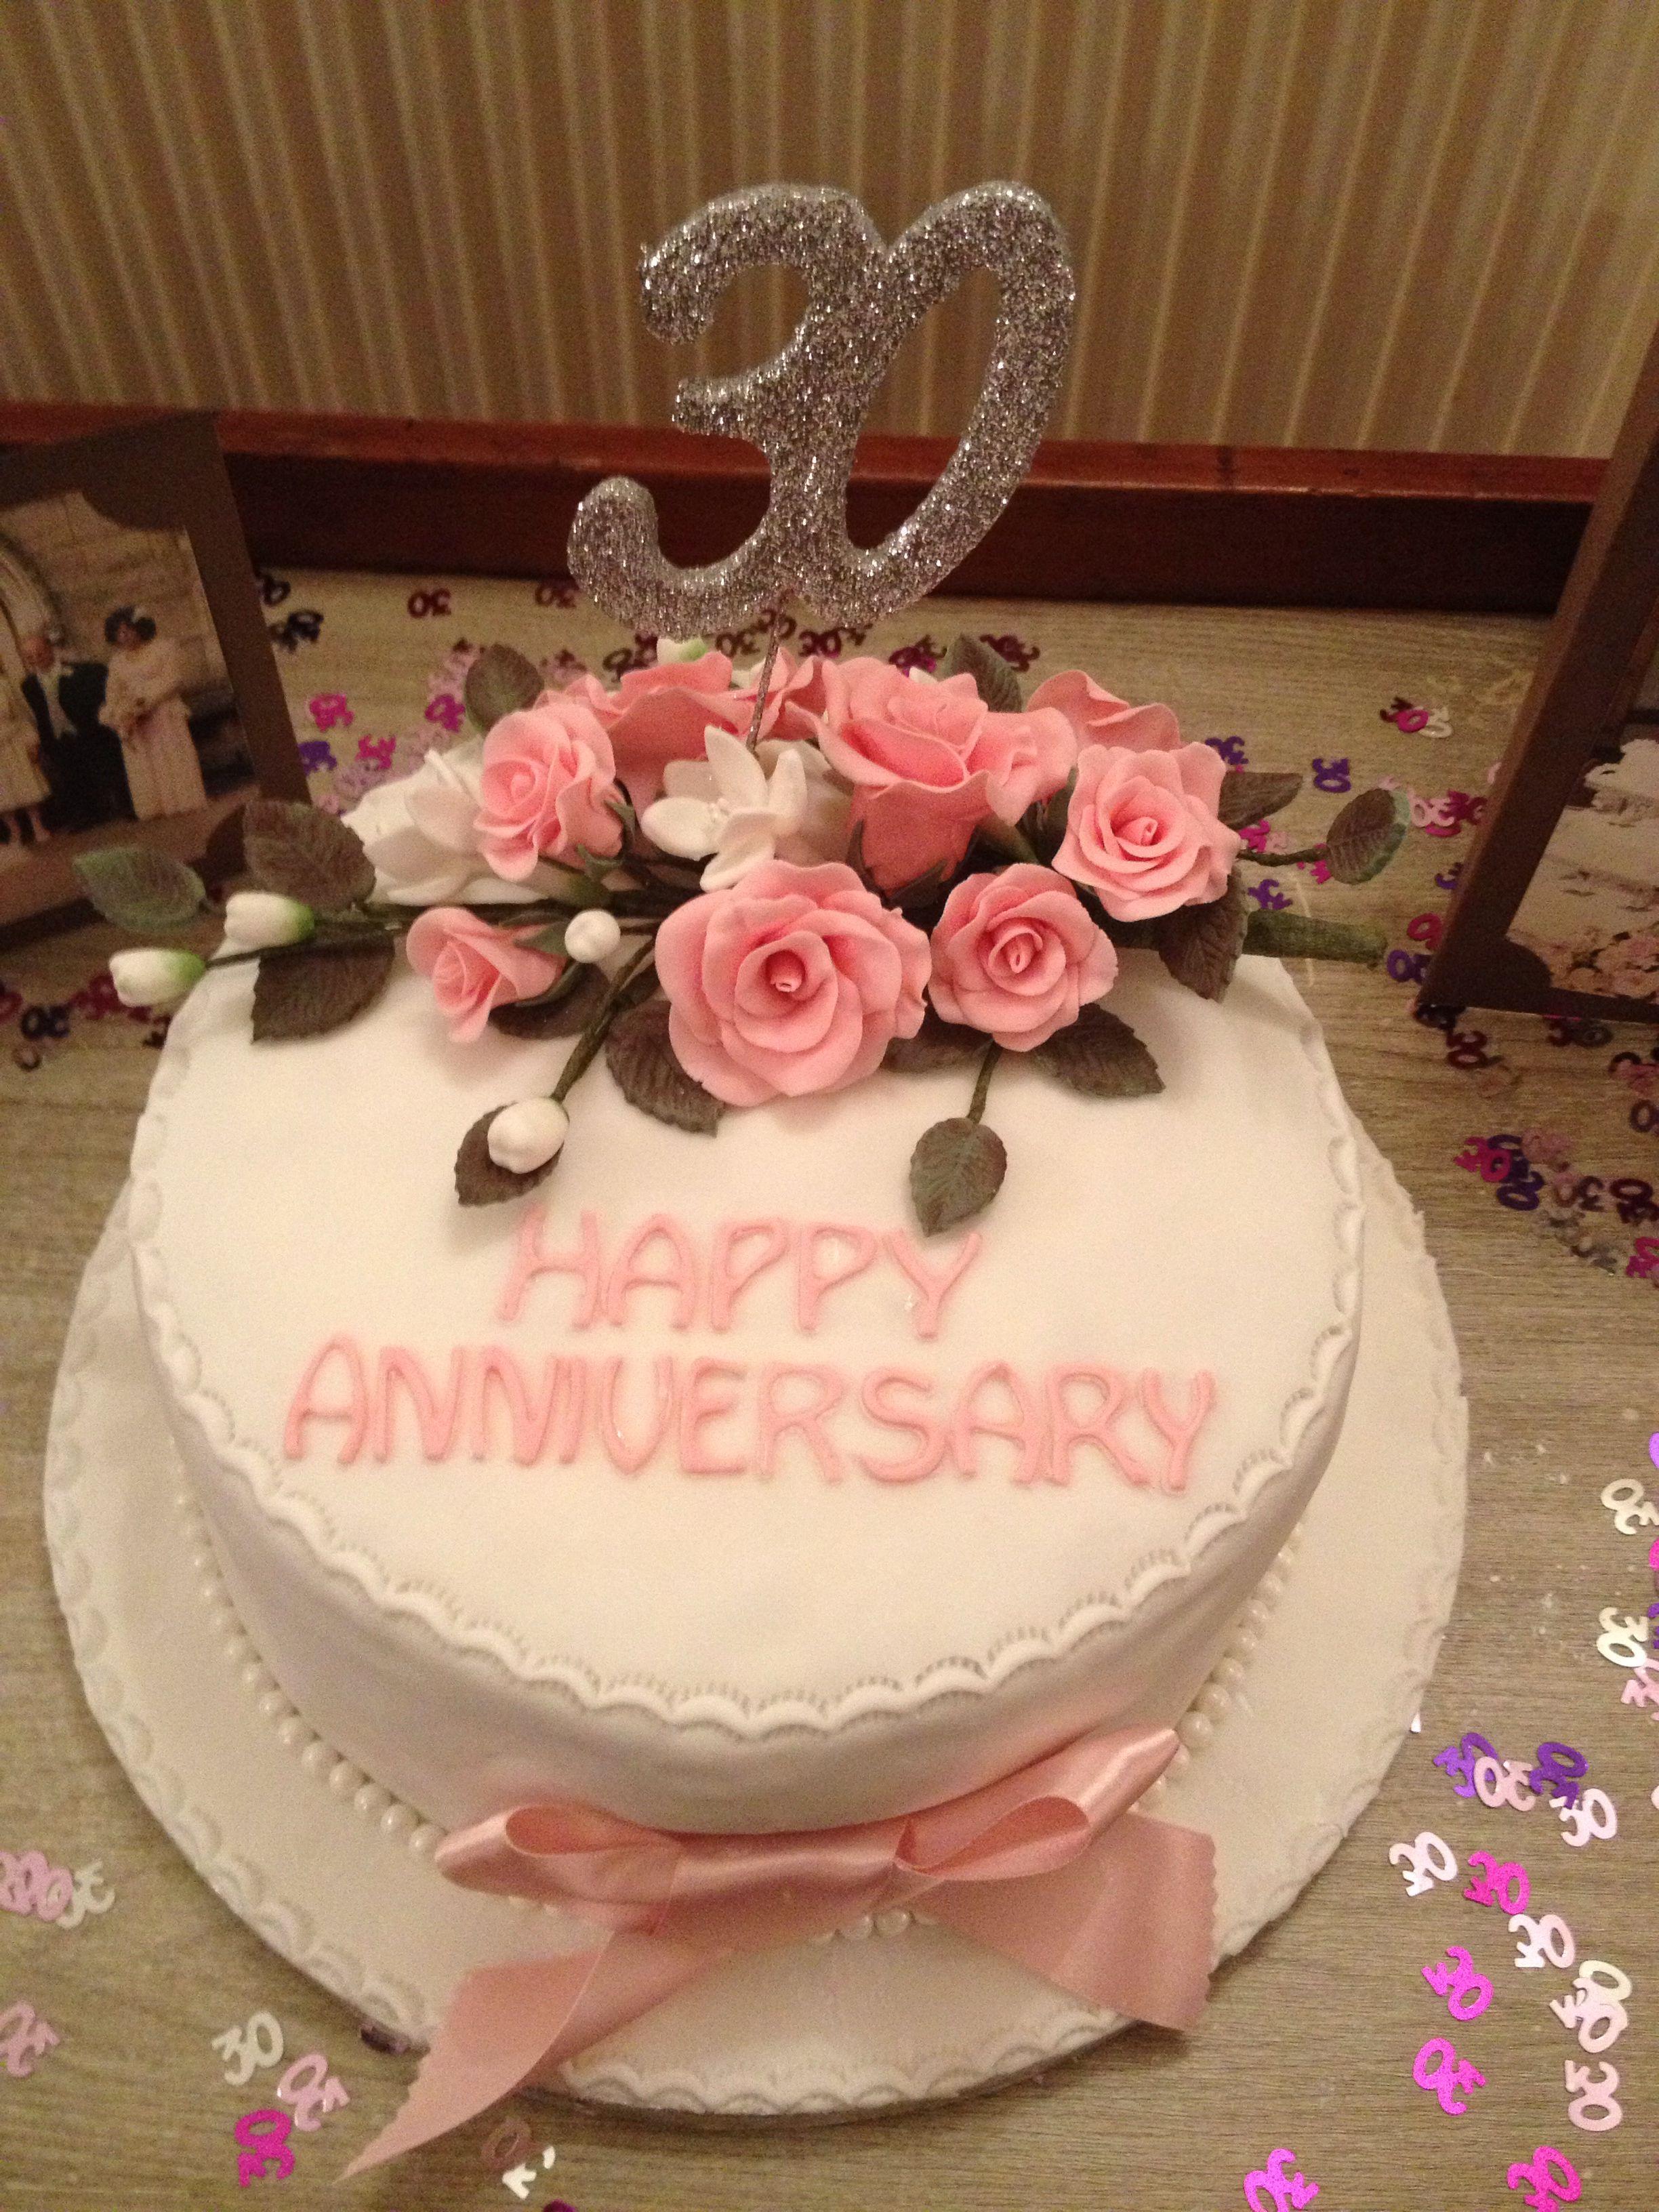 30th Wedding Anniversary Cake 30th Wedding Anniversary Cake Wedding Anniversary Cake Anniversary Cake